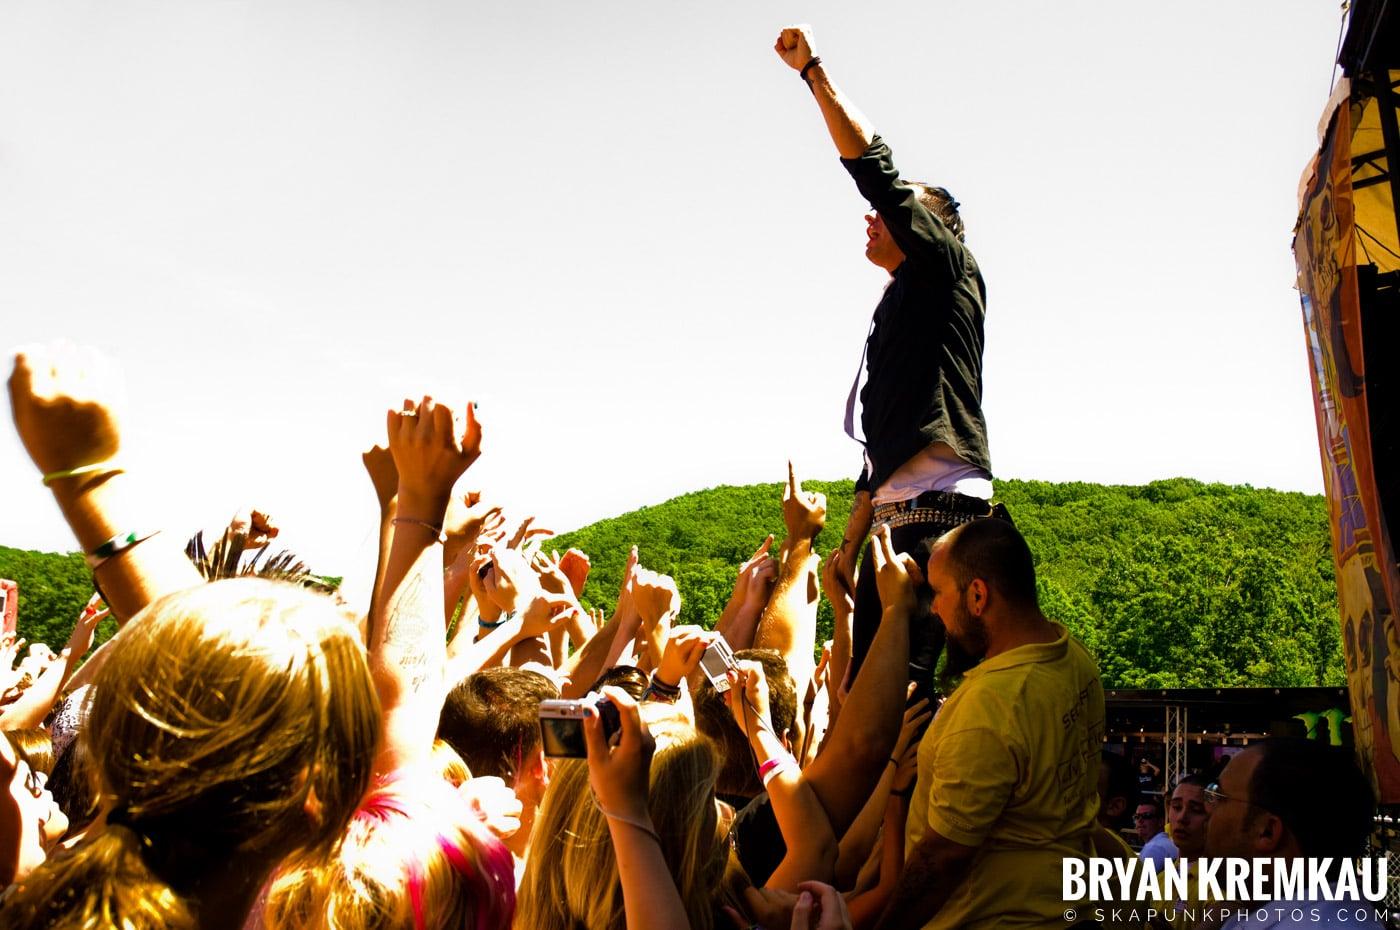 Anti-Flag @ Warped Tour 2009, Scranton PA - 07.15.09 (2)